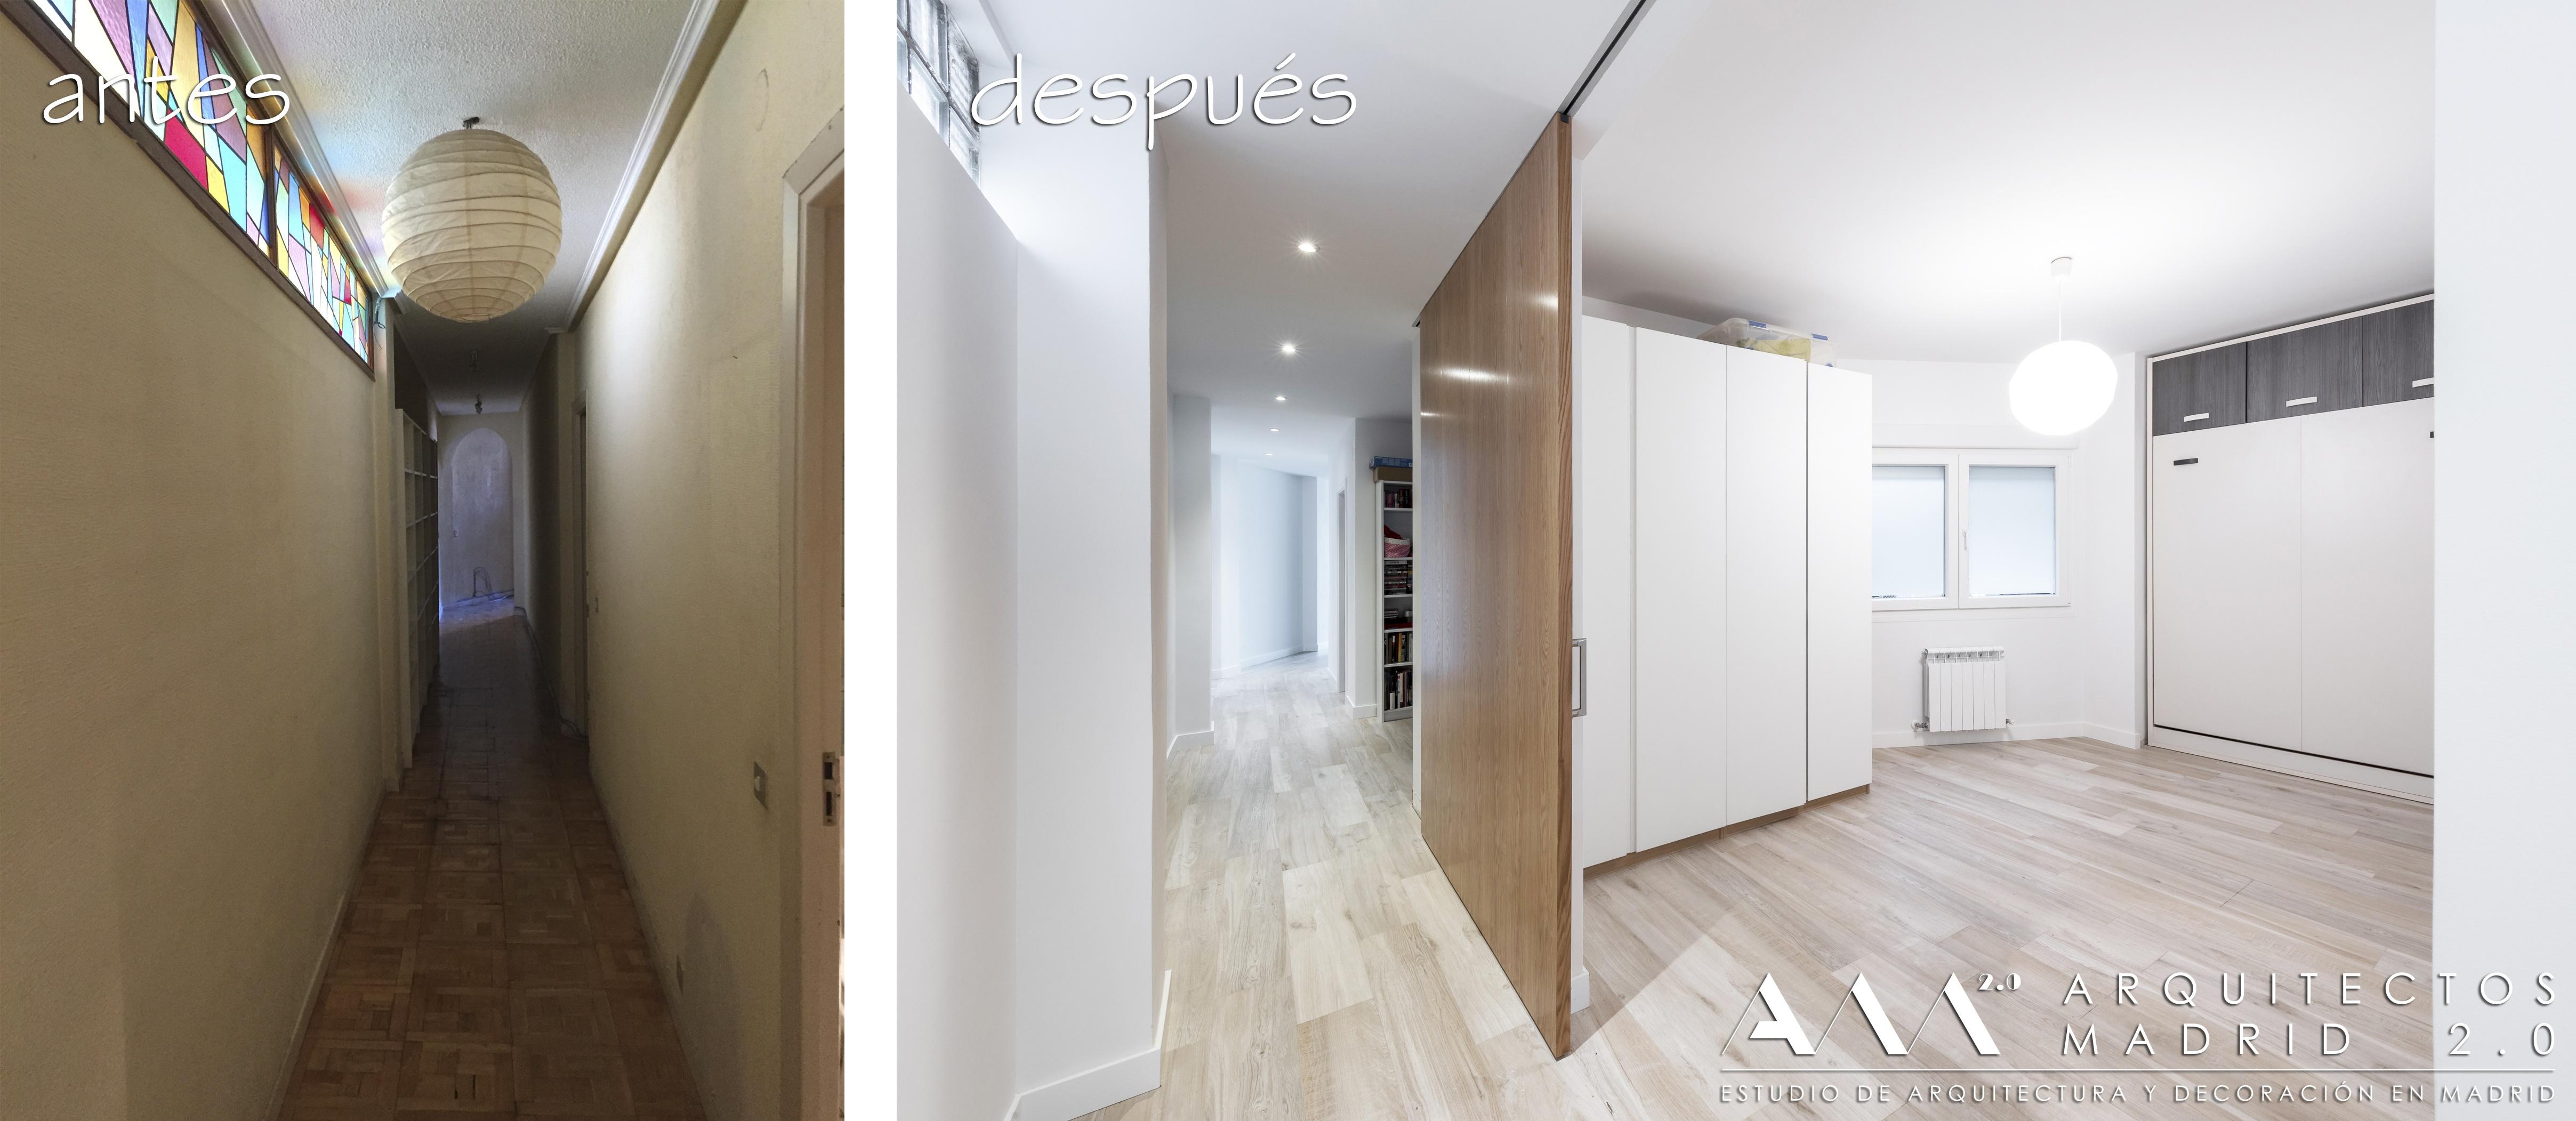 reforma-completa-de-vivienda-zona-atocha-madrid-antes-despues-pasillo